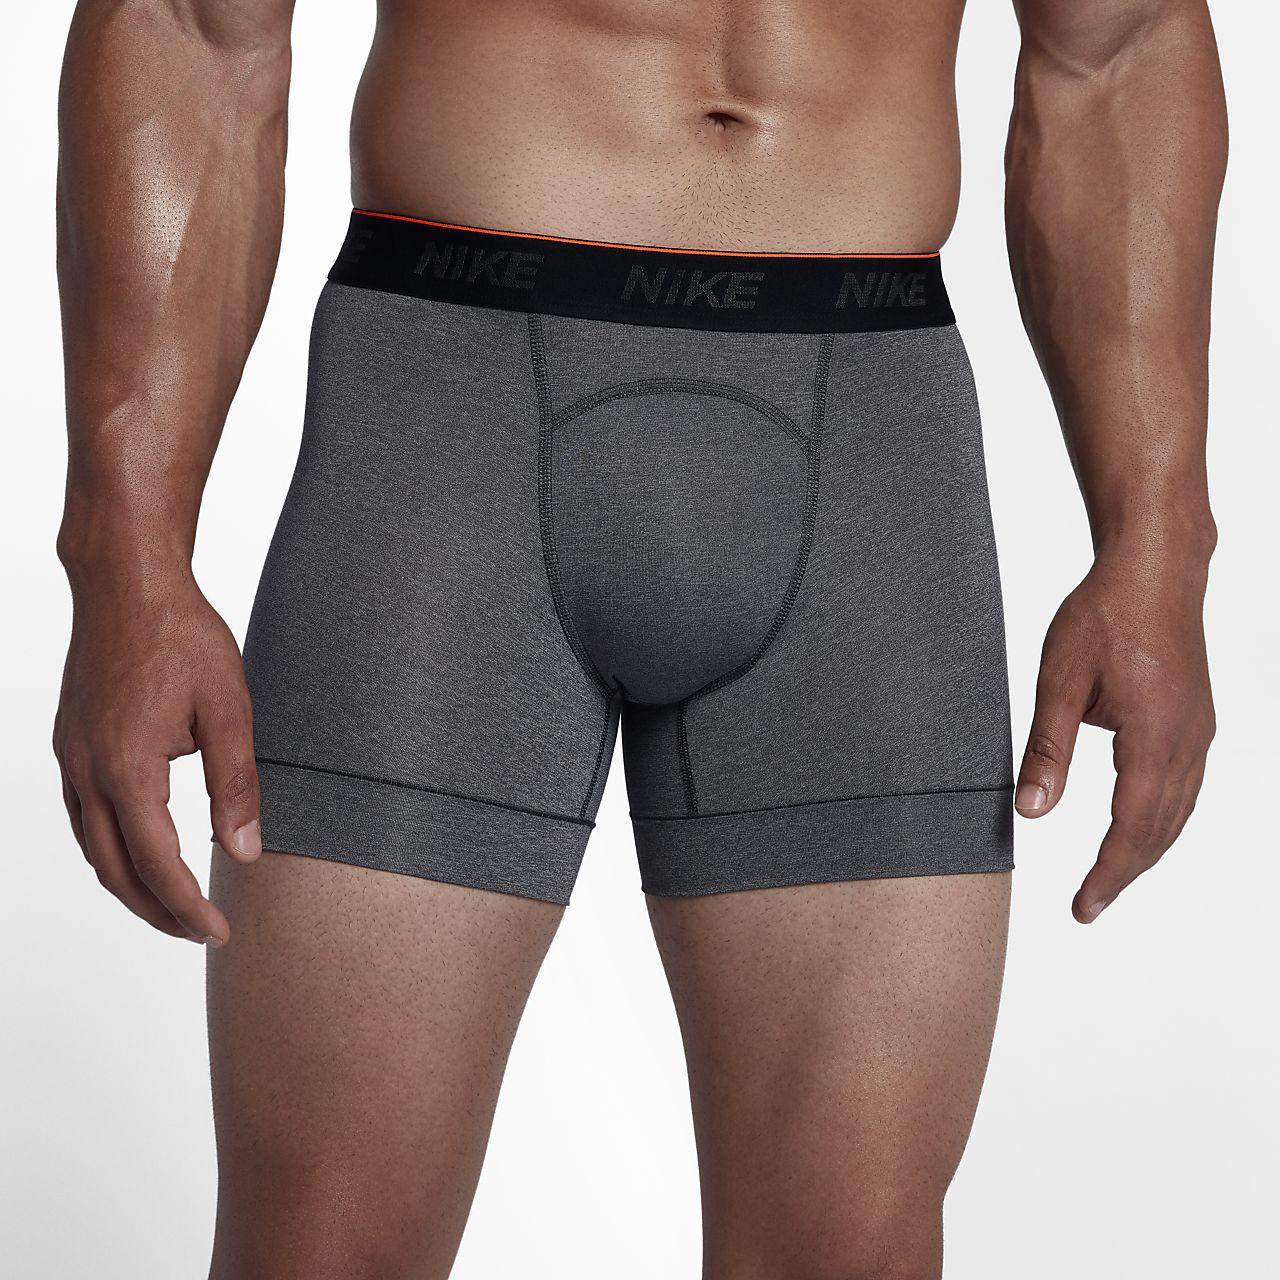 Nike Training Brief 2er Pack Boxershort Herren uOG8CU5GIC